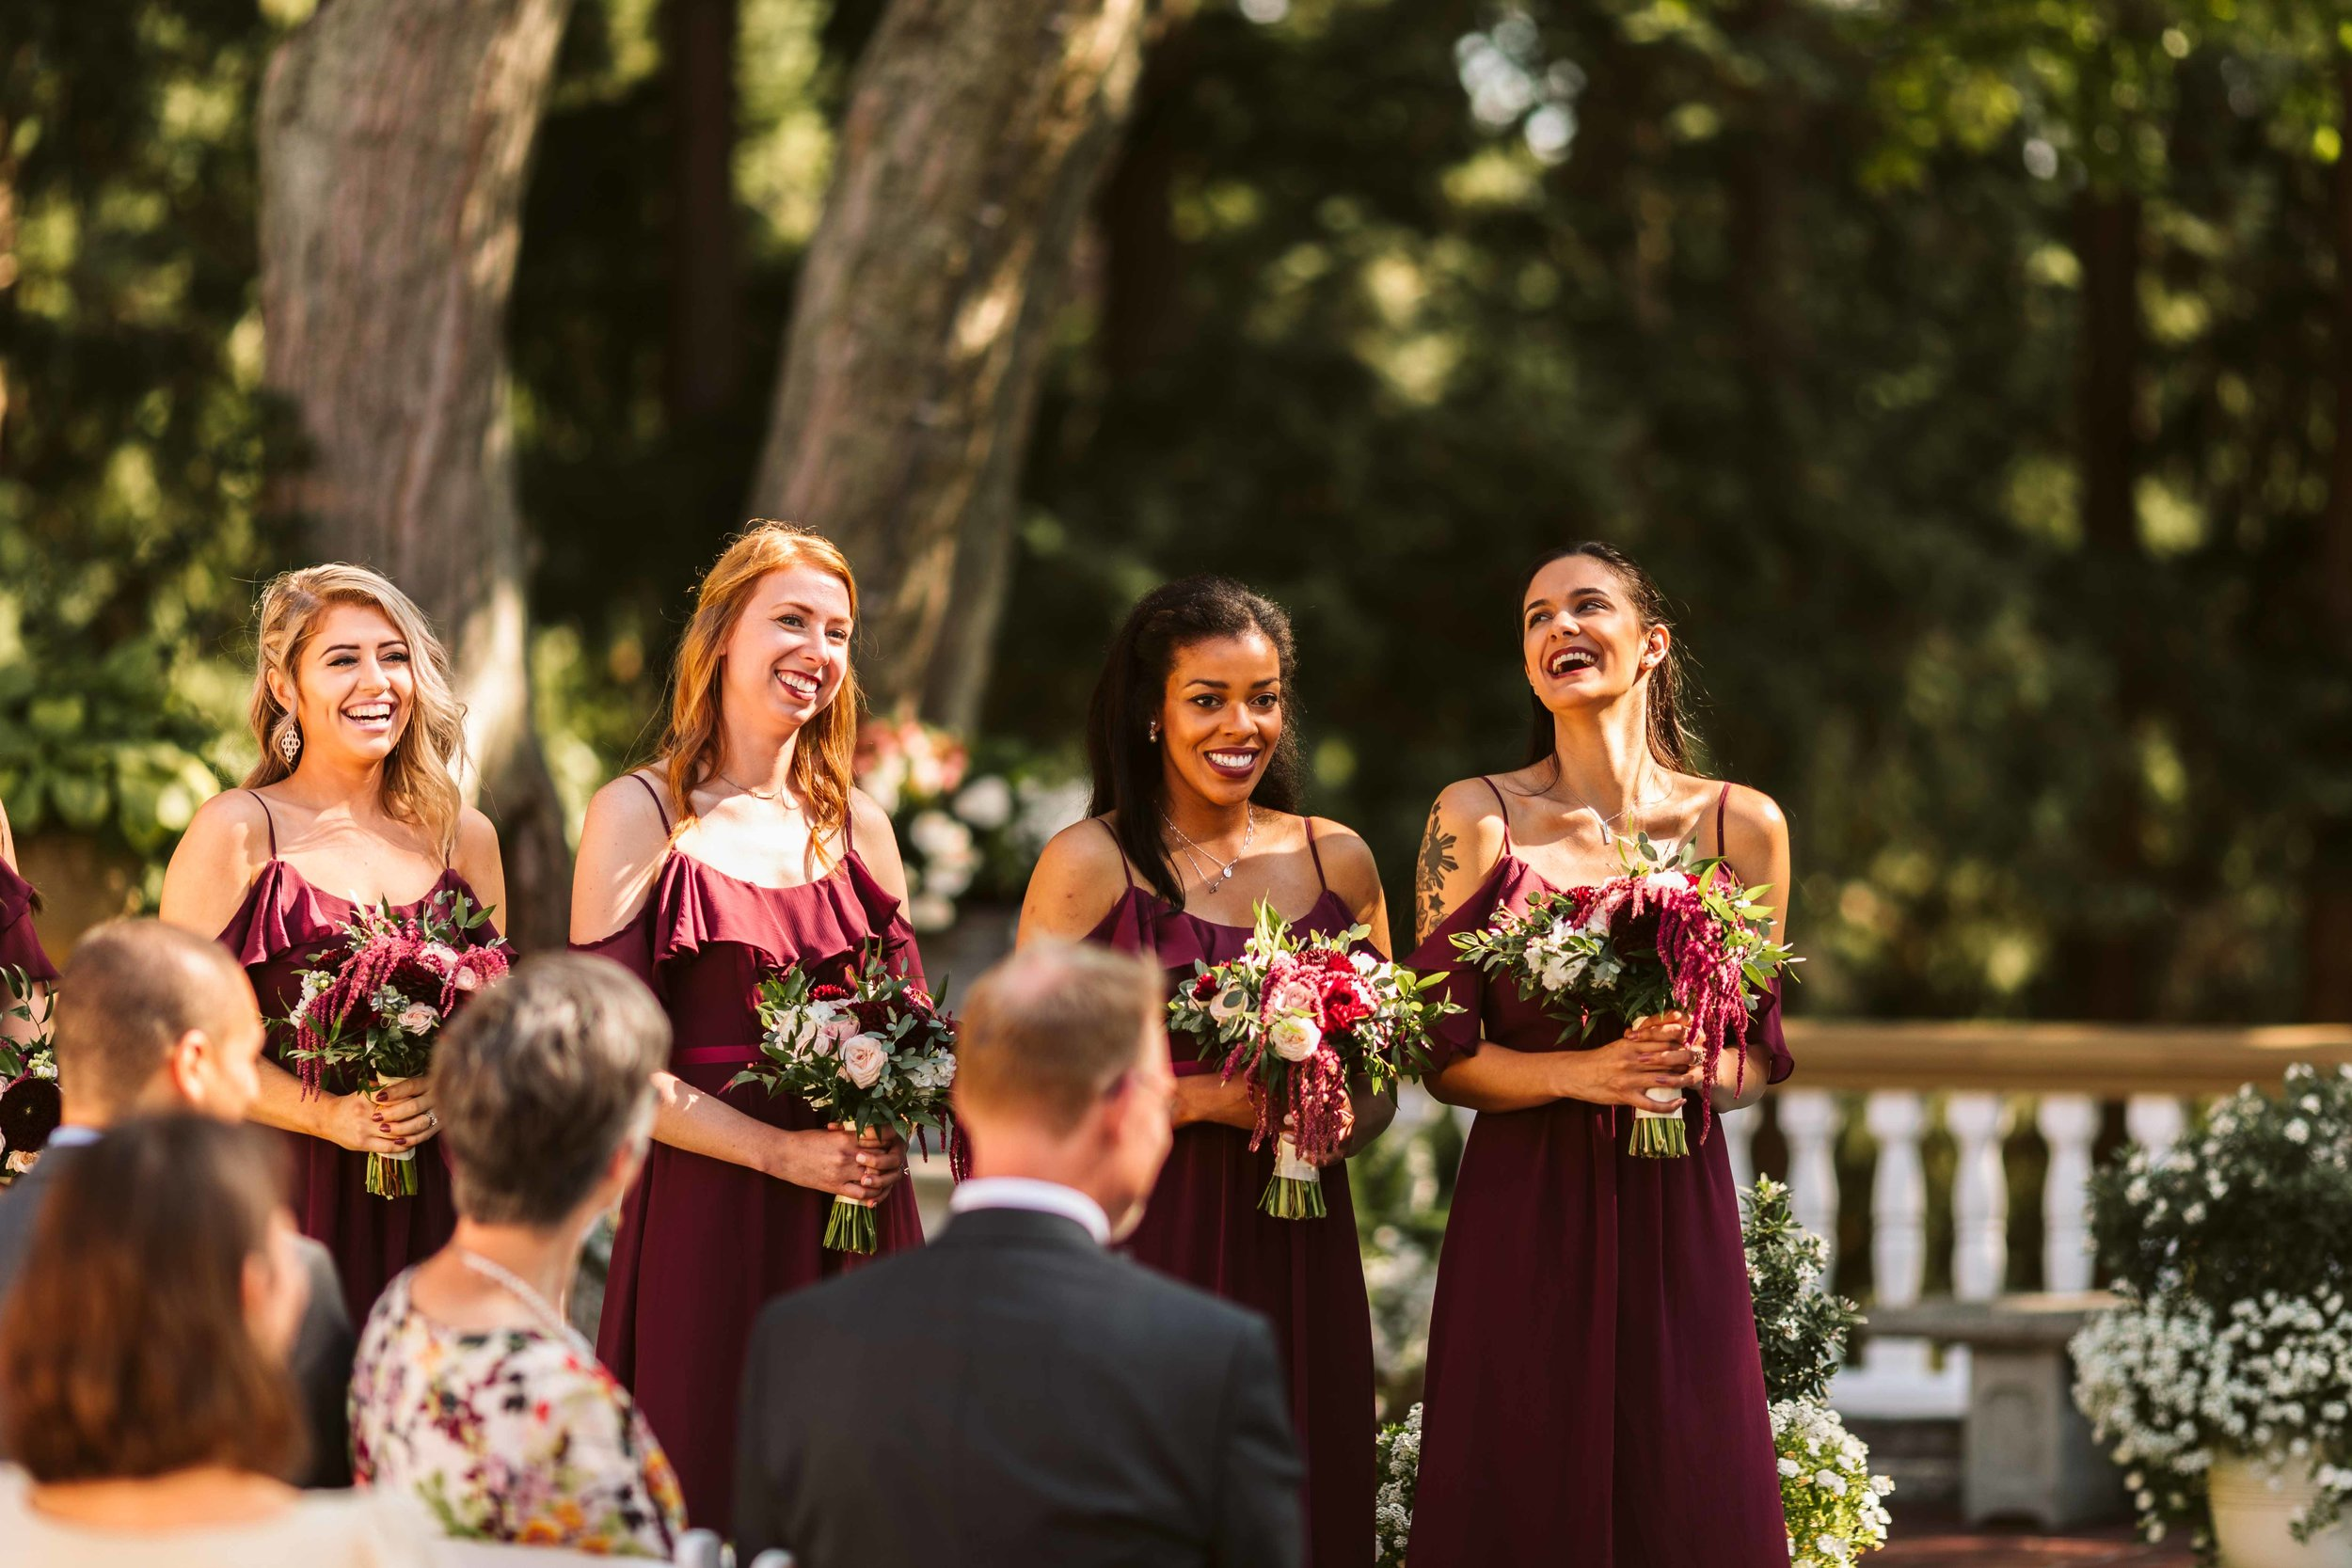 lairmont-manor-wedding-59.jpg